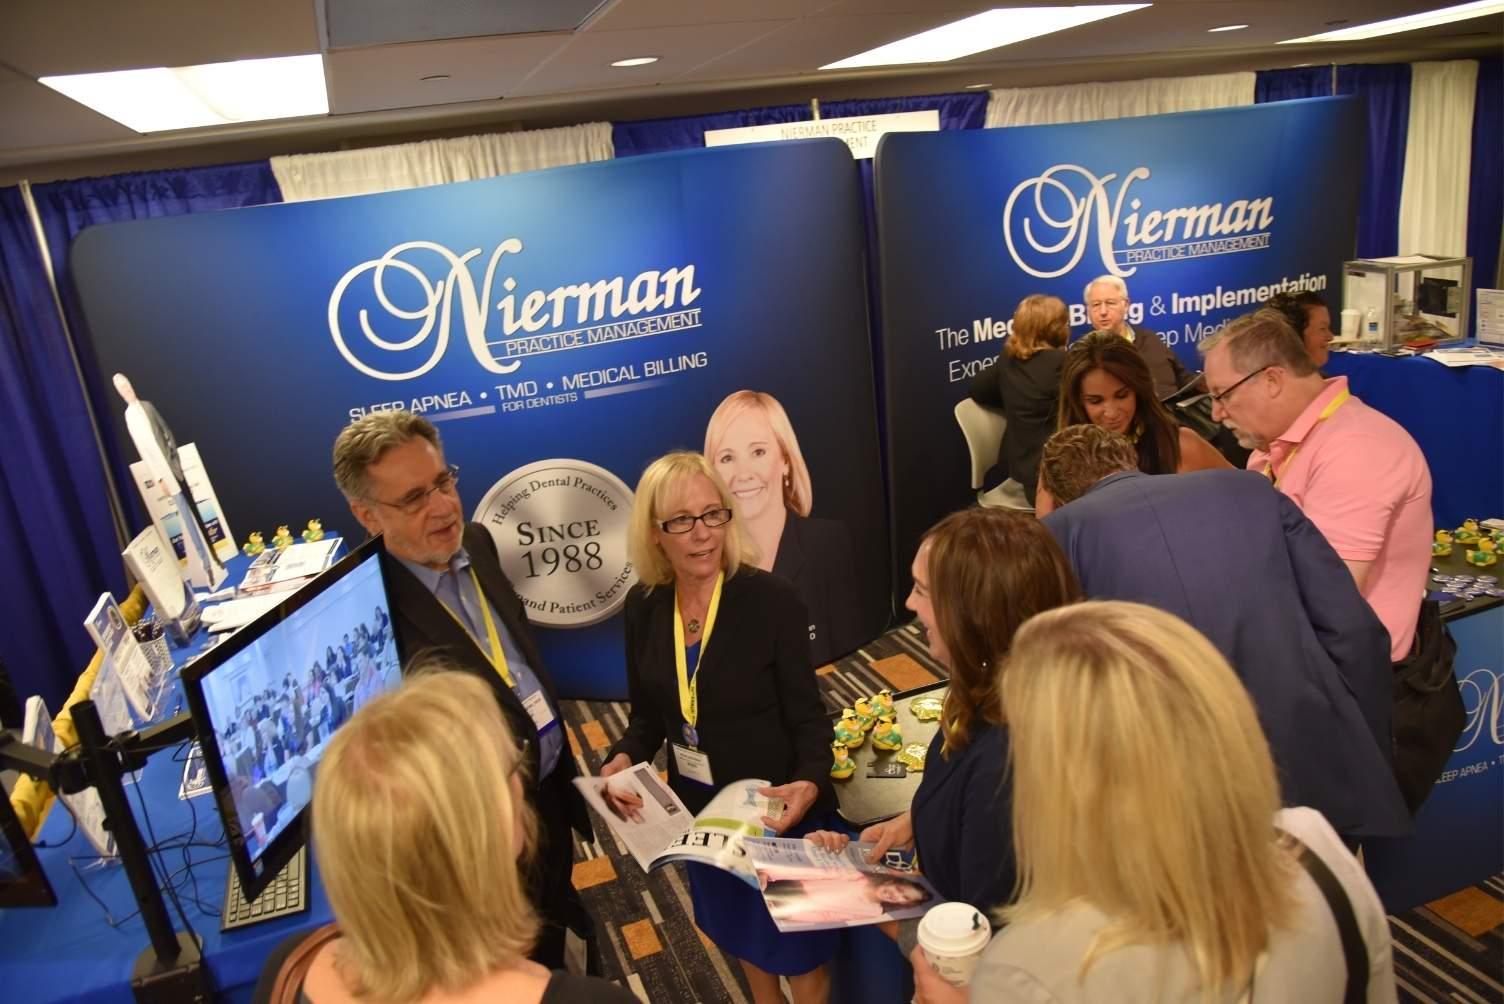 Rose Nierman at the Nierman Booth during the AADSM Annual Meeting